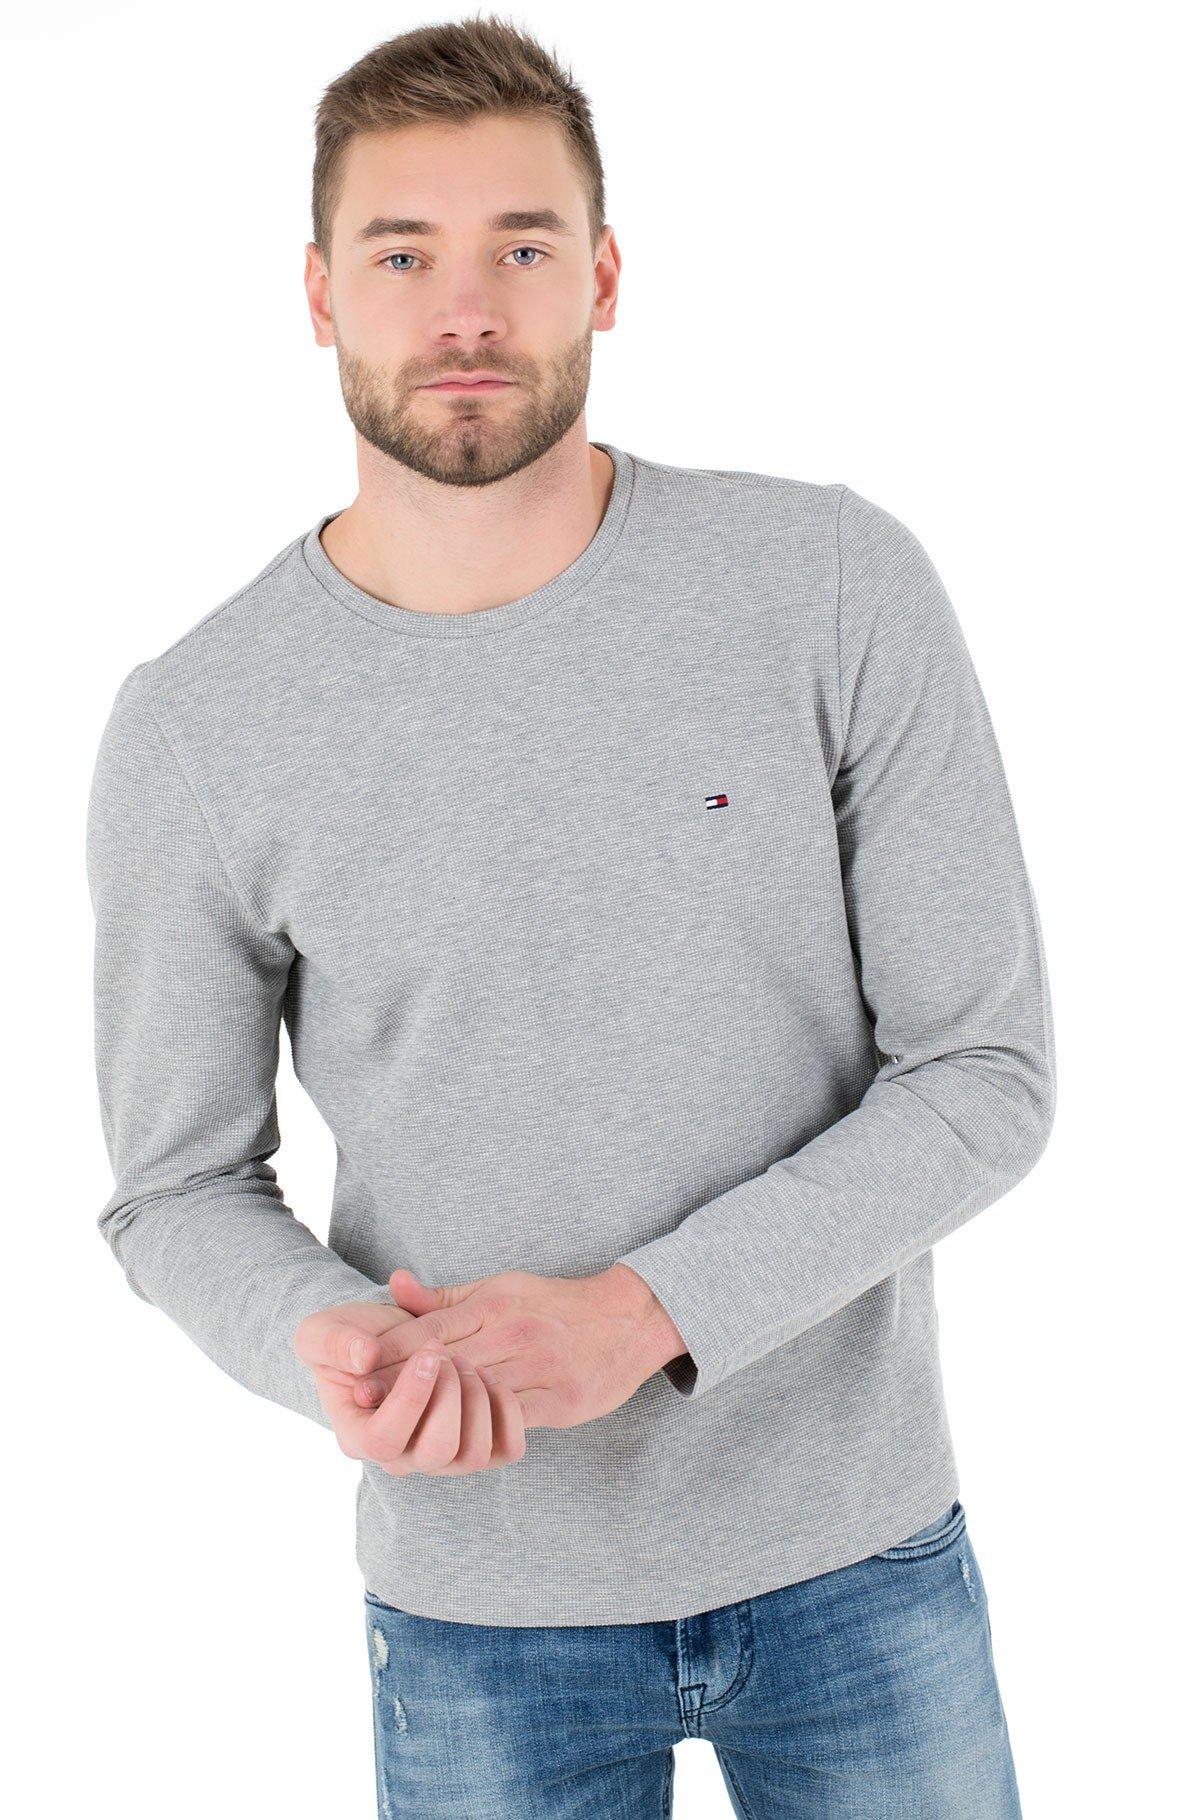 T-krekls ar garām piedurknēm  WAFFLE LONG SLEEVE TEE-full-1